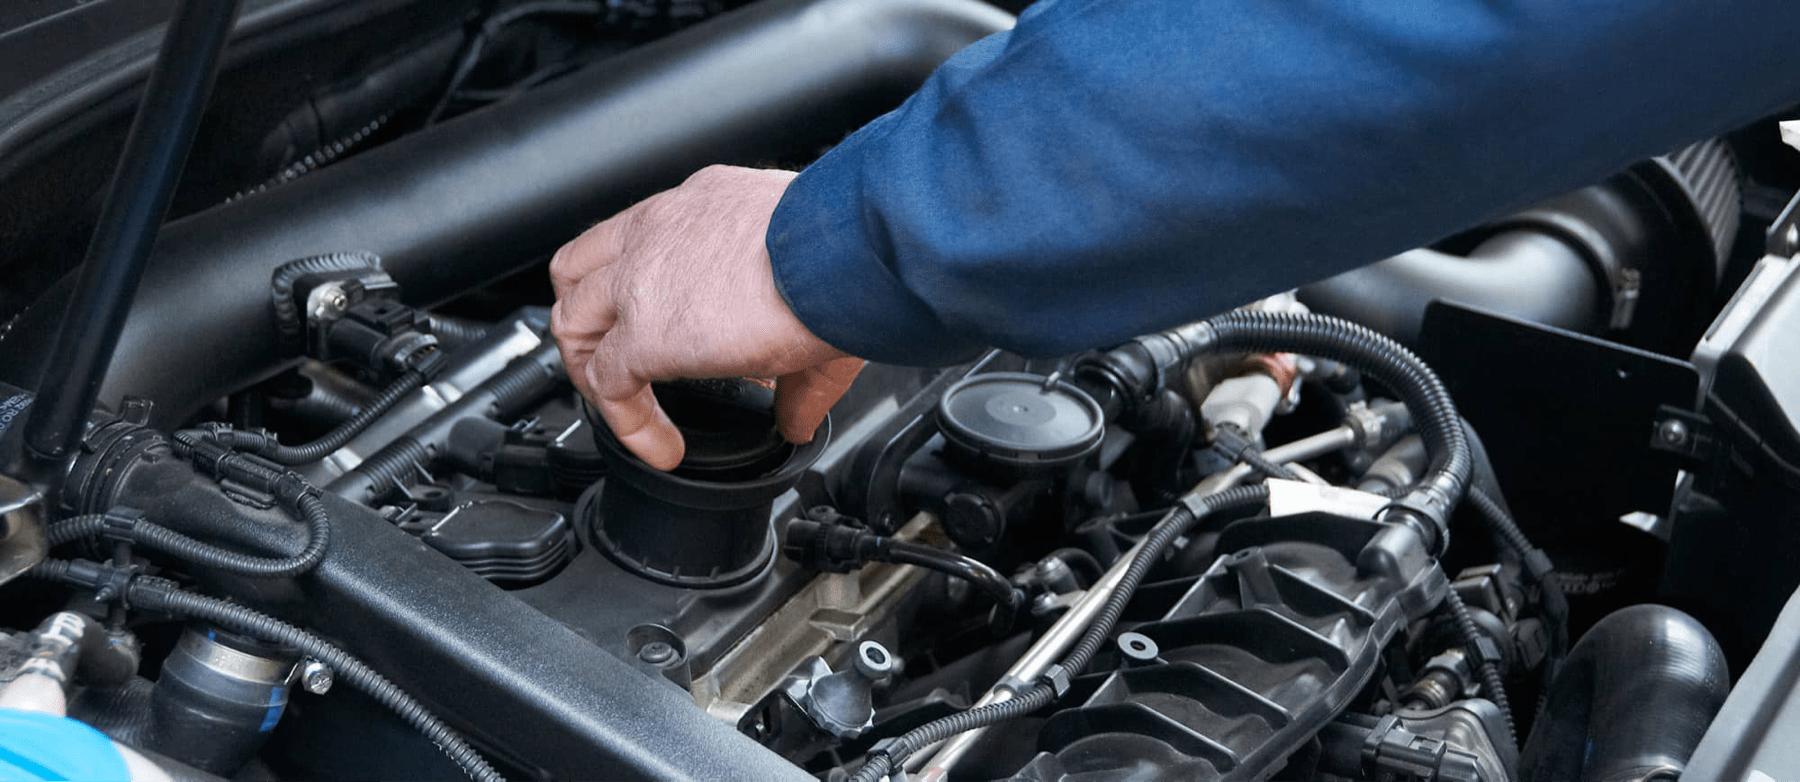 service technician unscrews oil reservoir in car engine